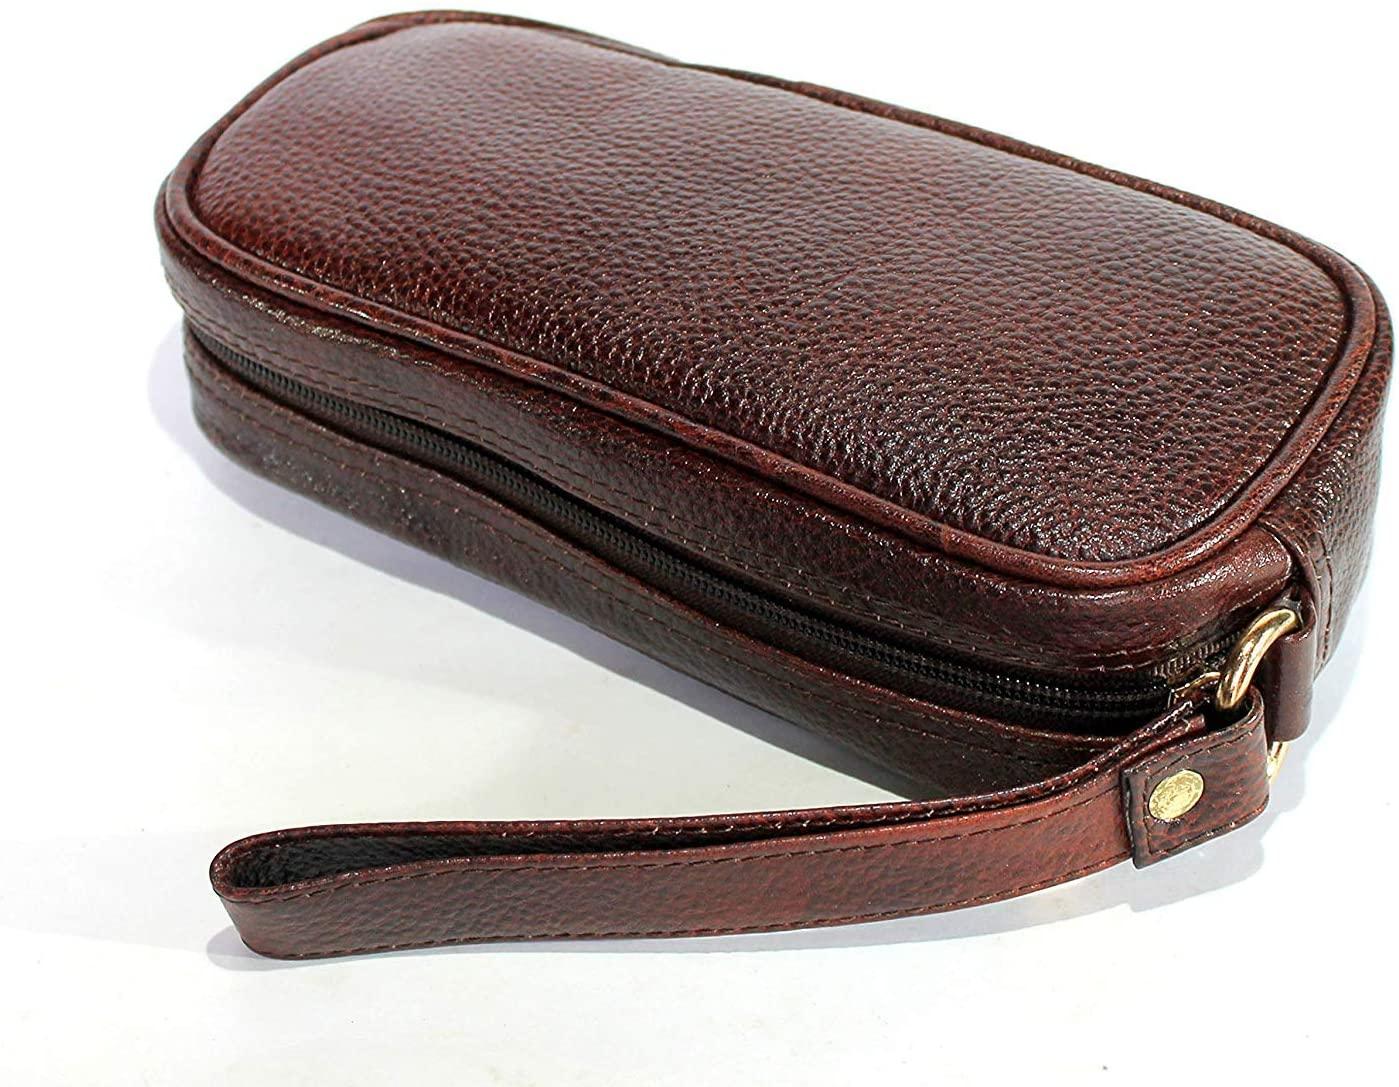 Stonkraft Leather Toiletry Bag Grooming Cosmetic Hygiene Bathroom Pouch Dopp Kit Case Makeup Shaving Kit Hanging Travel Organizer Gift (Brown)